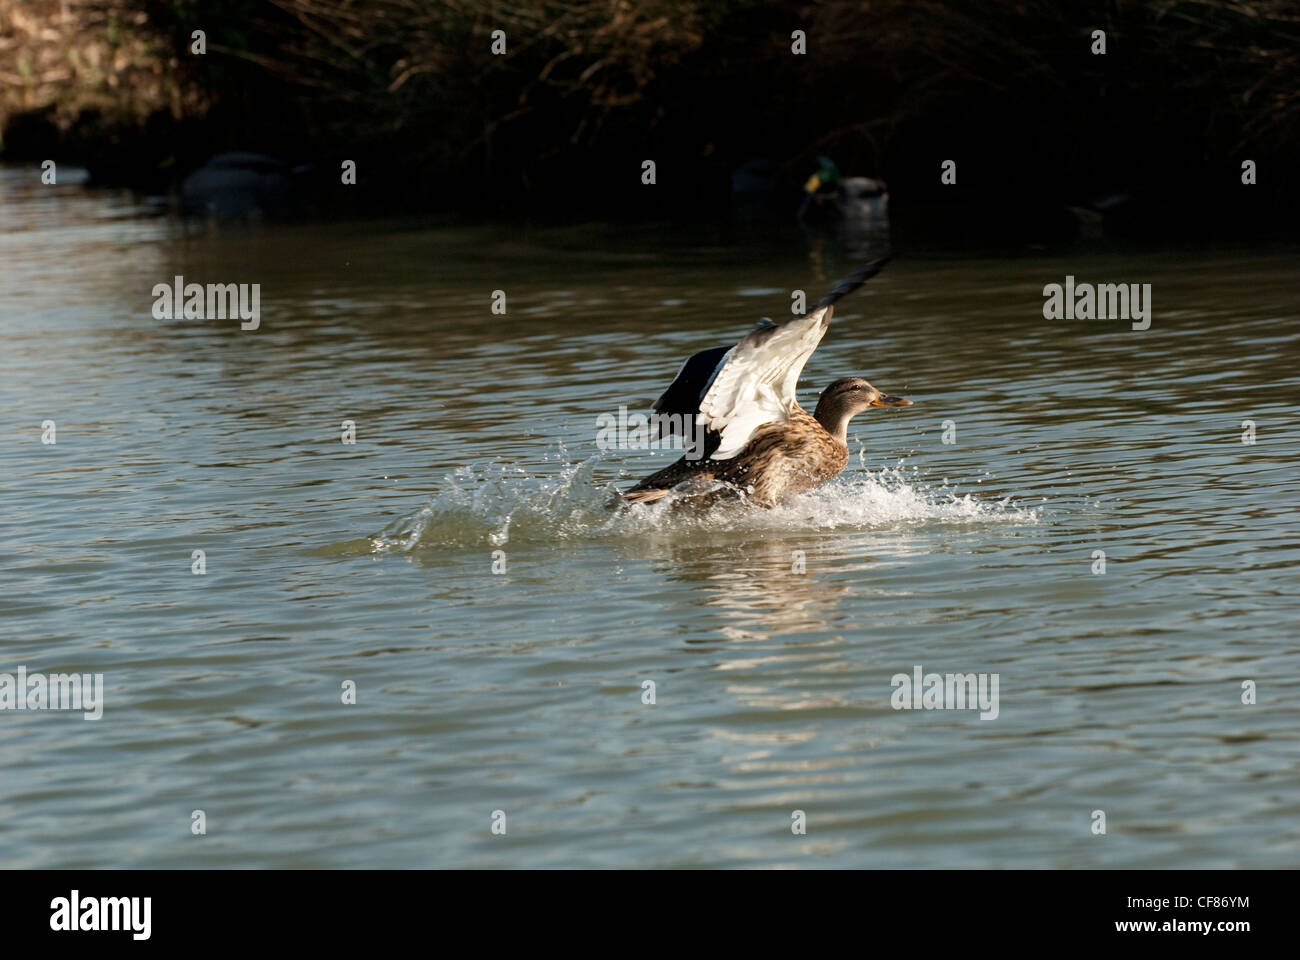 Mallard, WWT (Wildfowl and Wetlands Trust) London Wetland Centre, UK - Stock Image